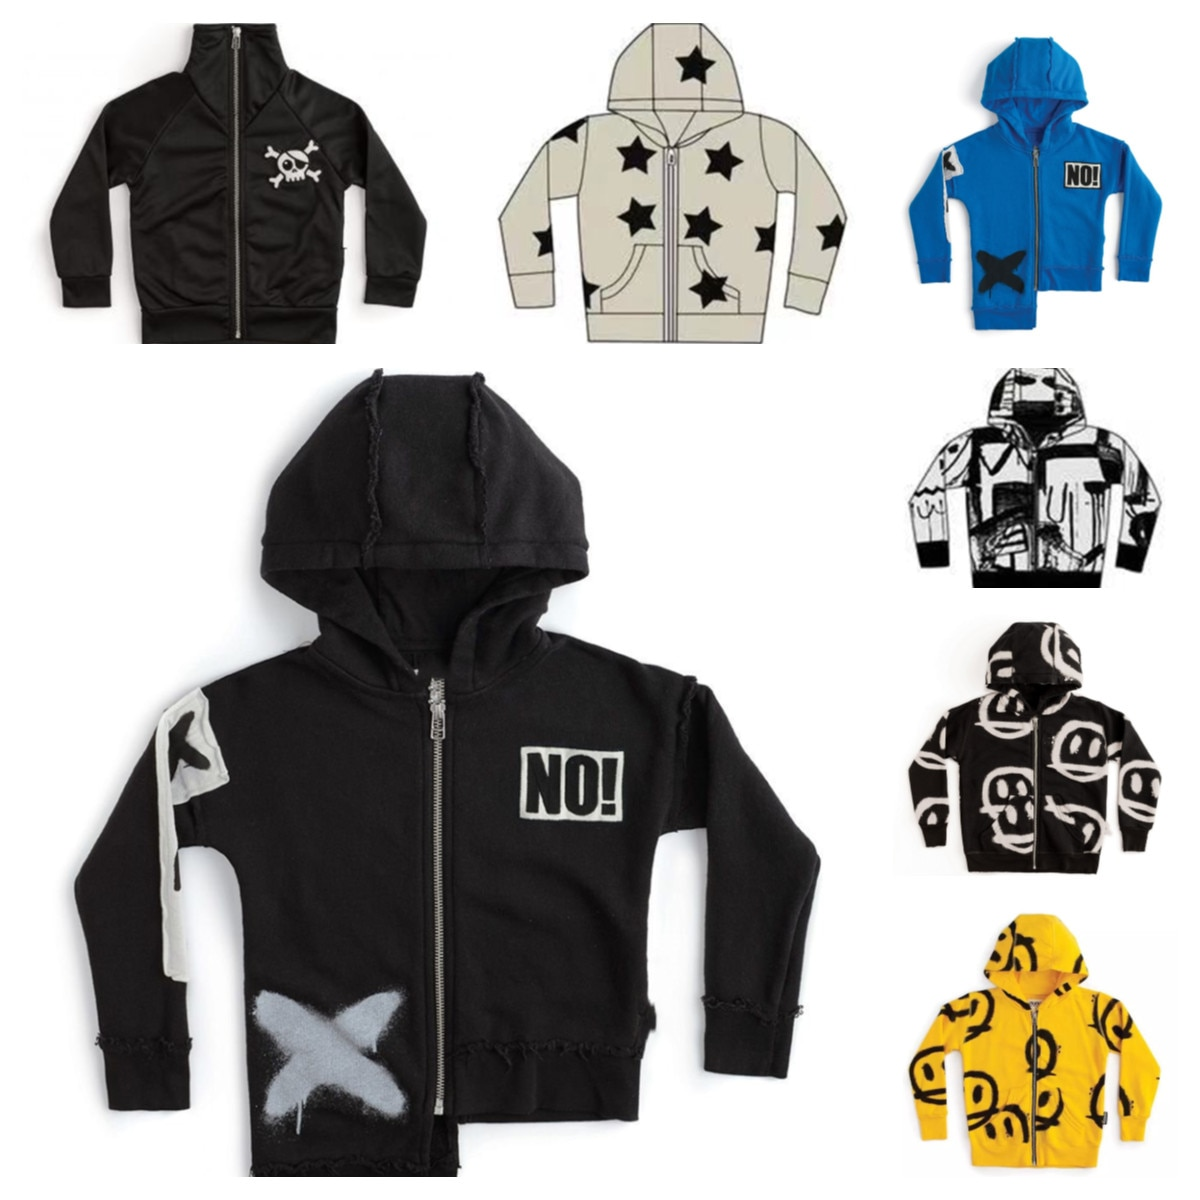 N-Spot 2020 autum ad witer ew boys' cotto fashio prited sweater